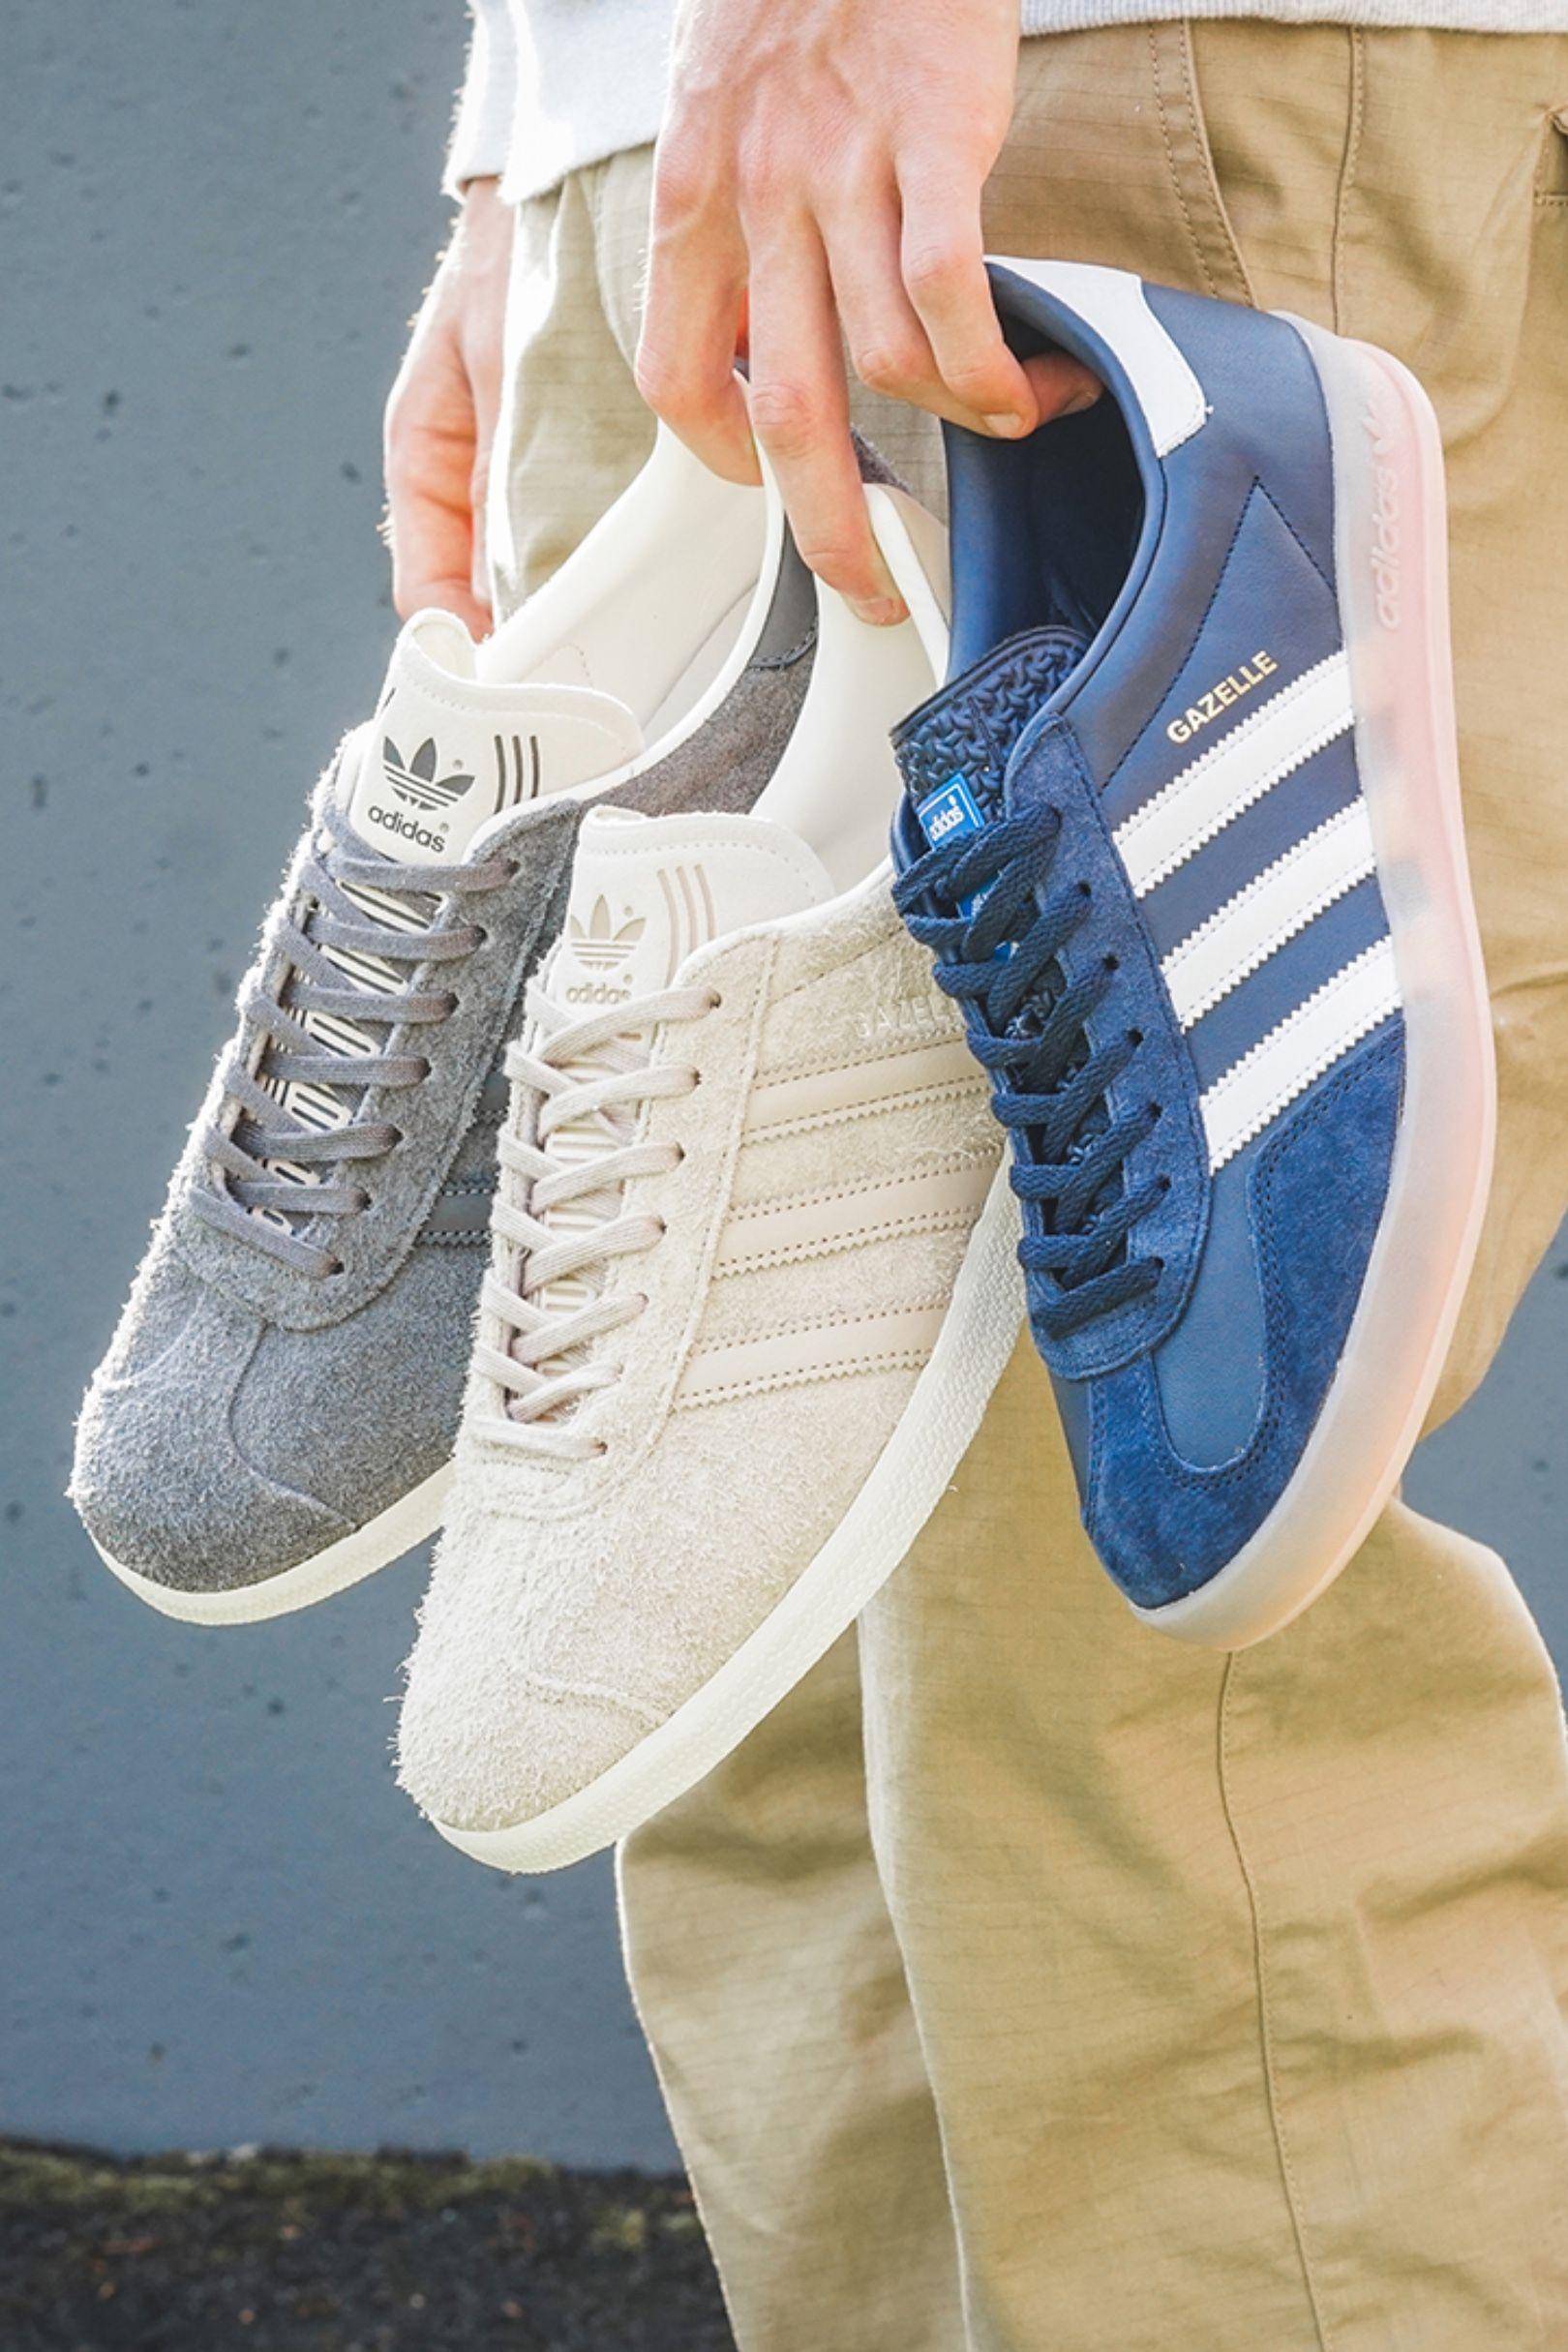 Adidas gazelle, Sneakers, Sneaker stores